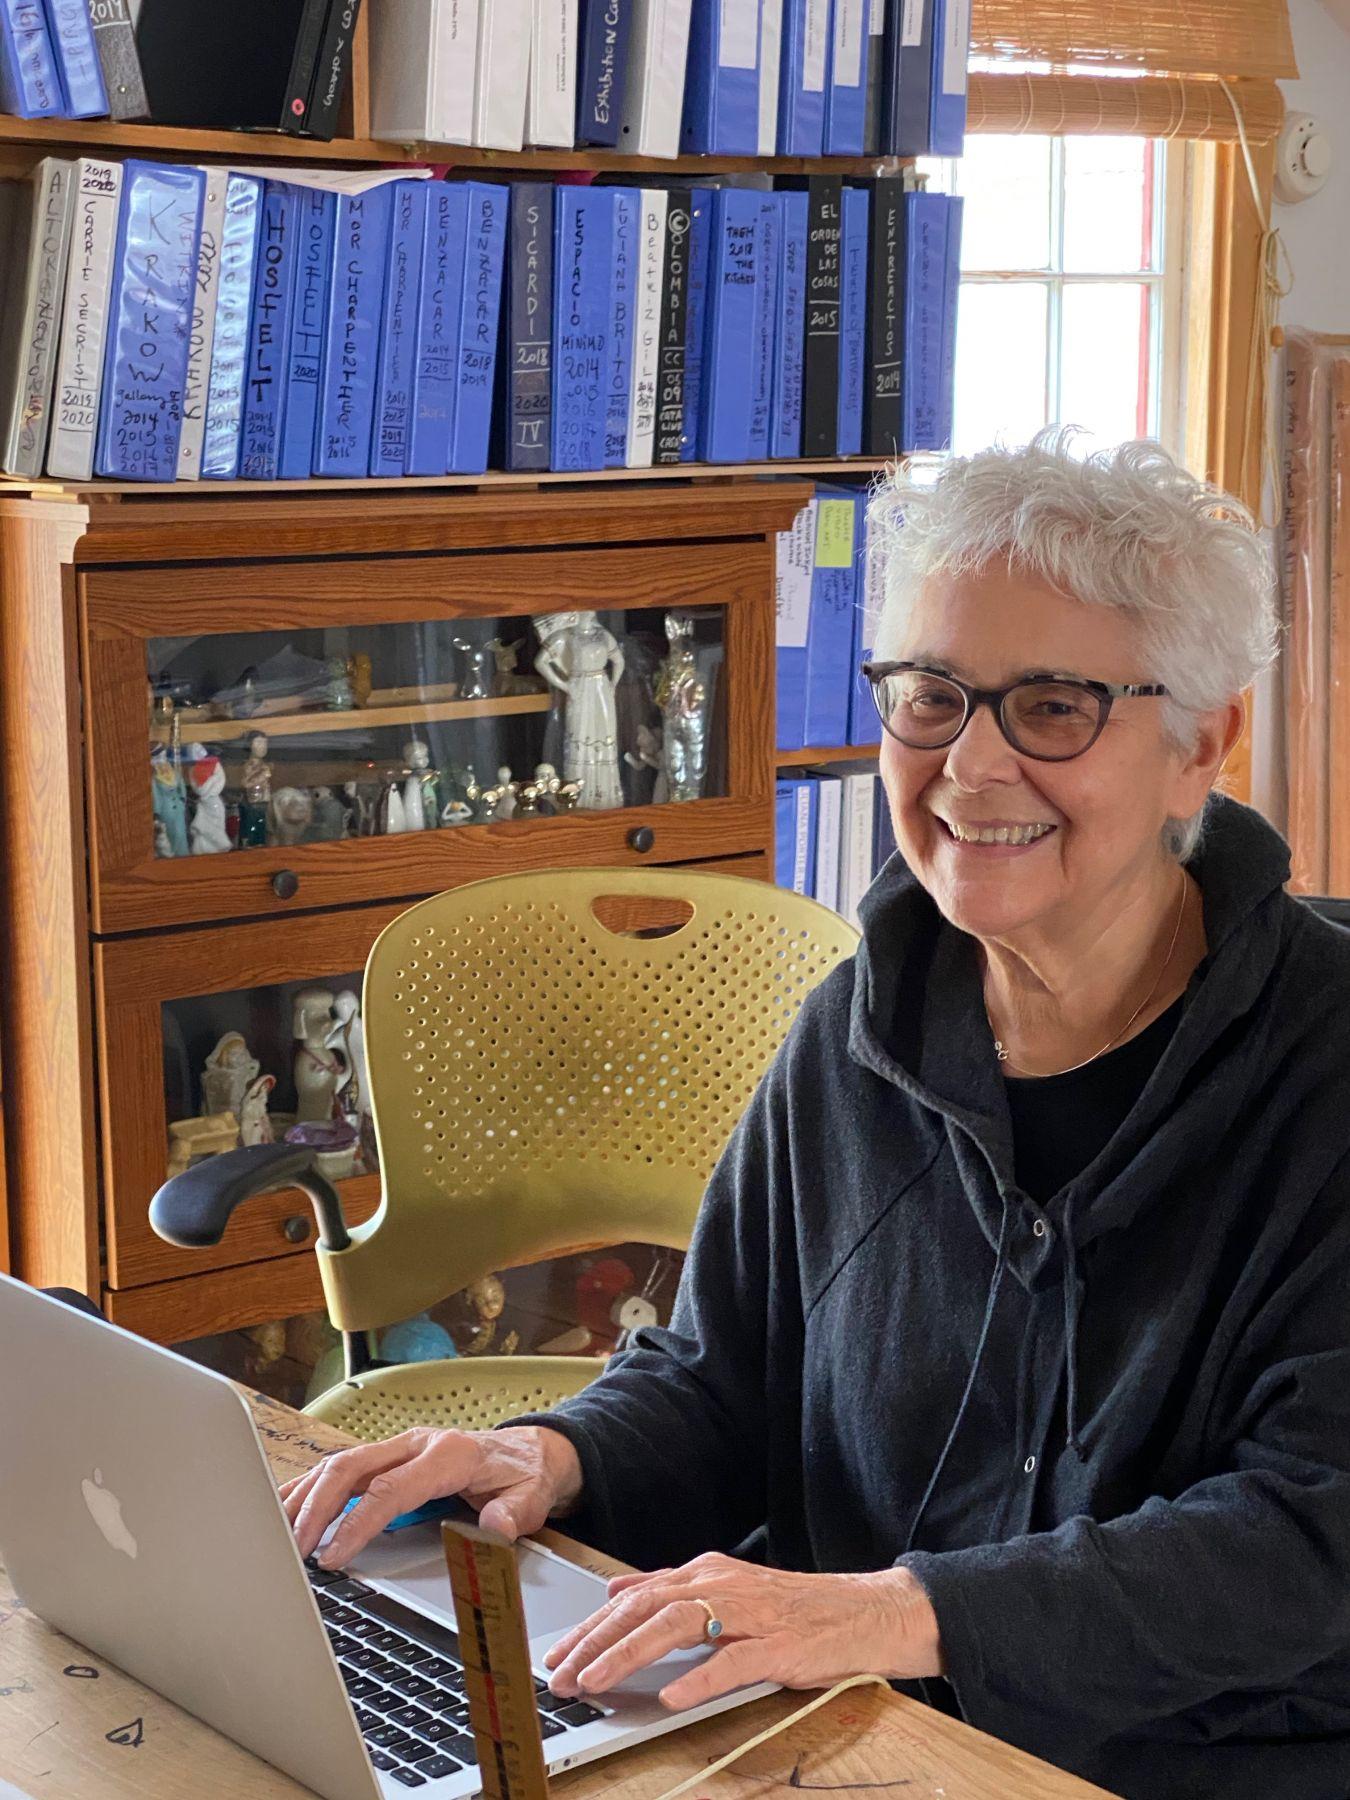 Liliana Porter working in her studio in Rhinebeck, March 2020.